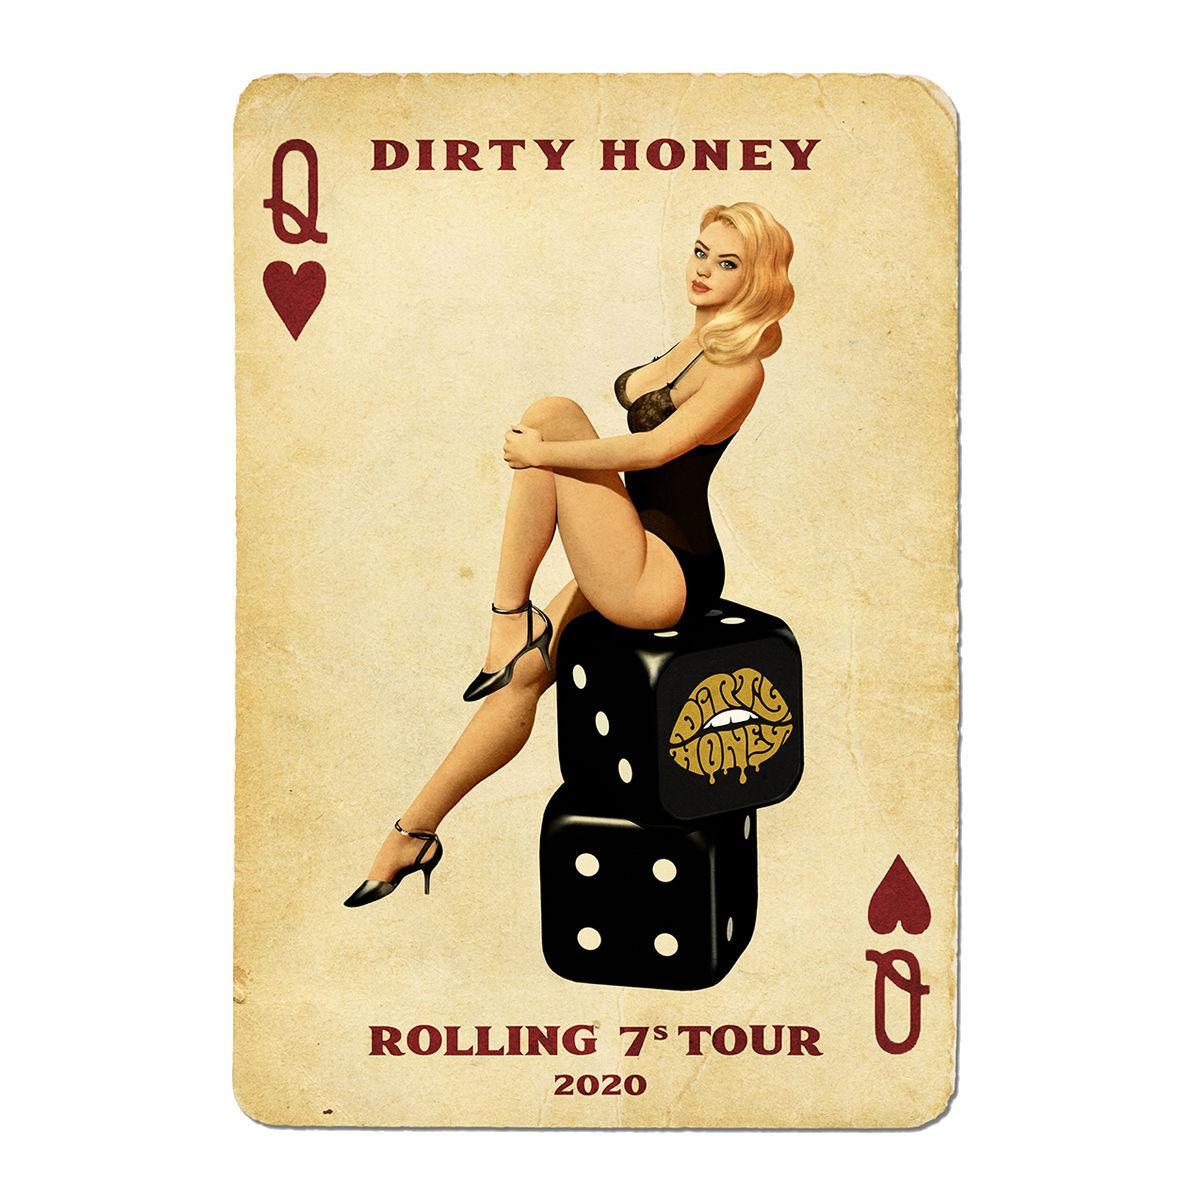 Dirty Honey 2020 Tour Poster